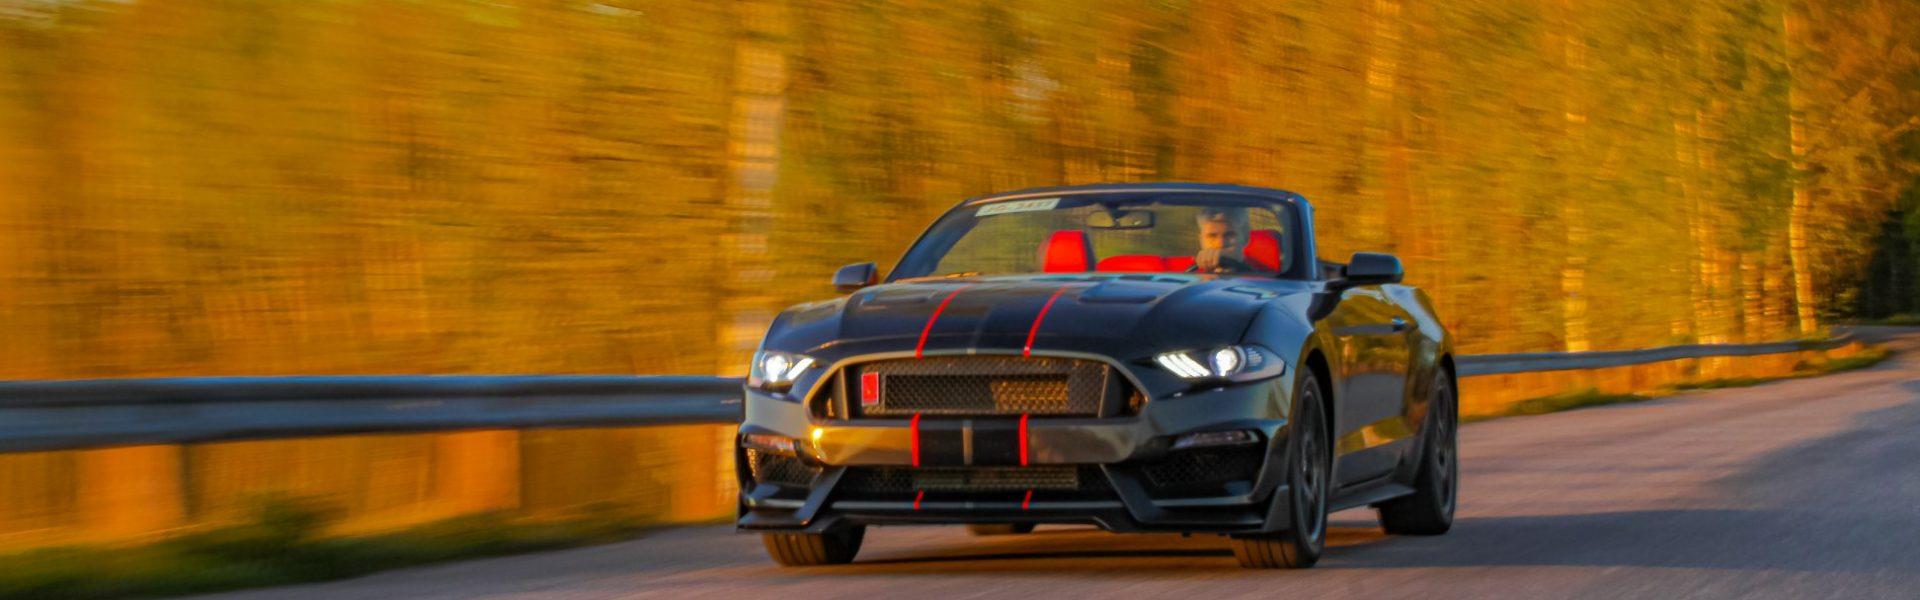 VMH x Menoauto x Ford Mustang